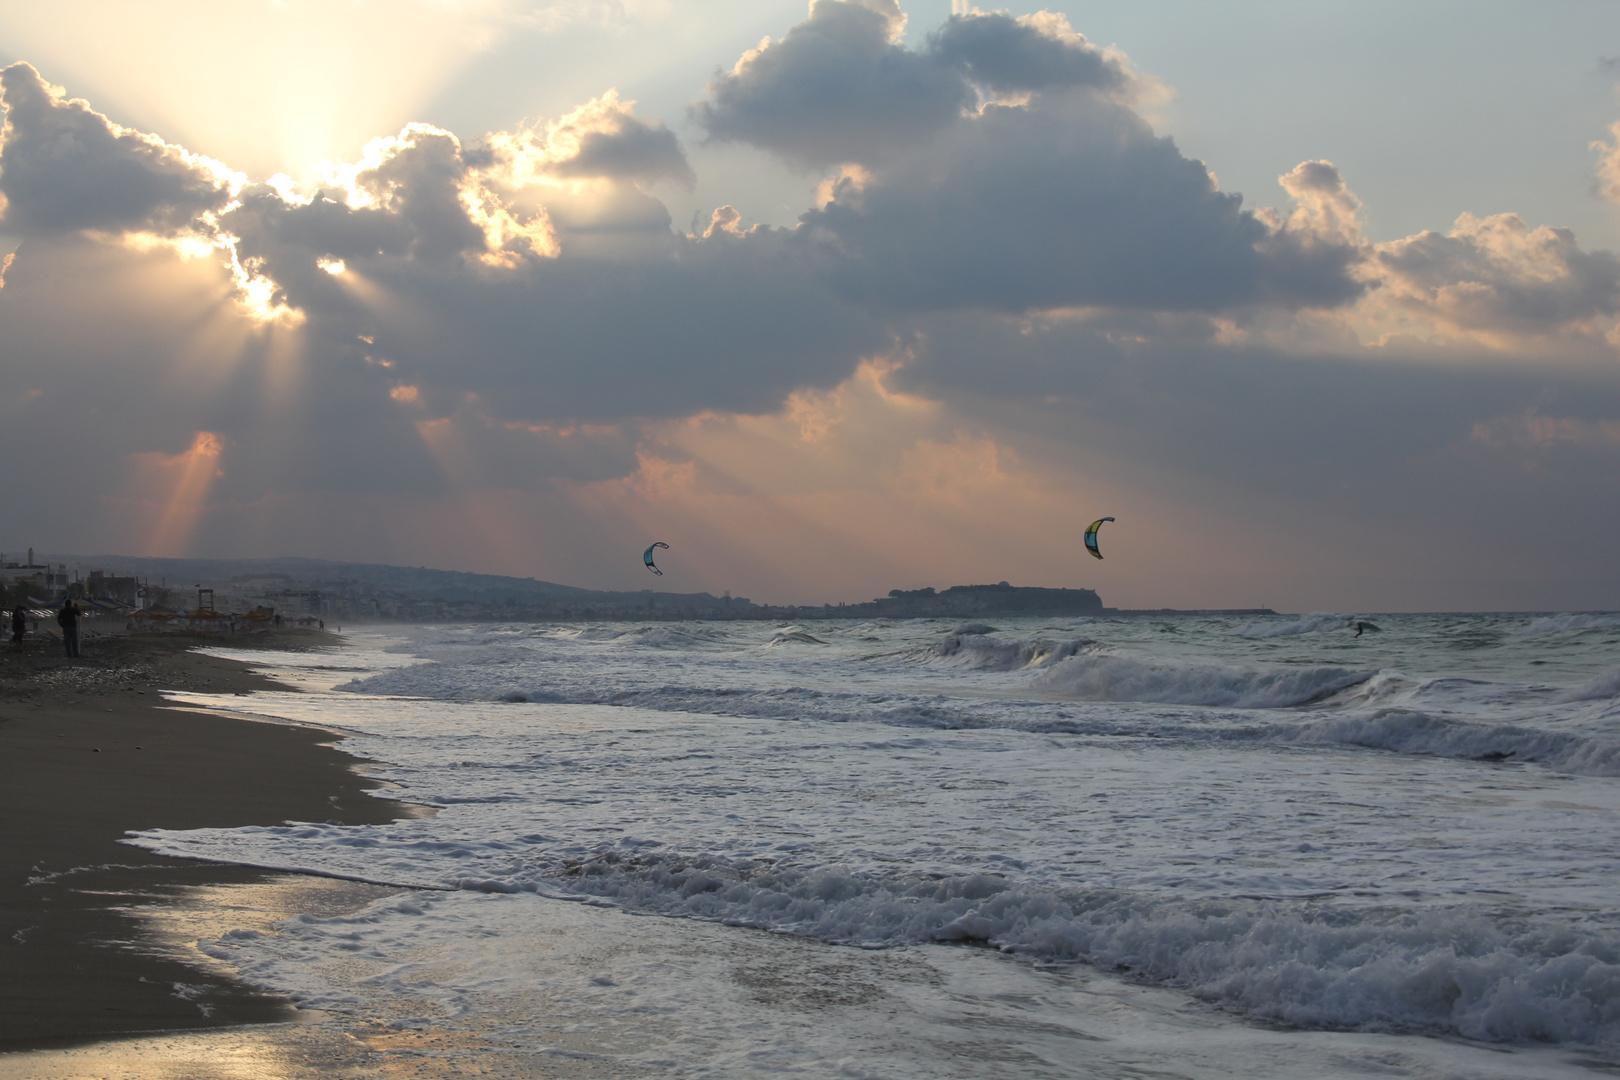 windiger Spaziergang auf Kreta